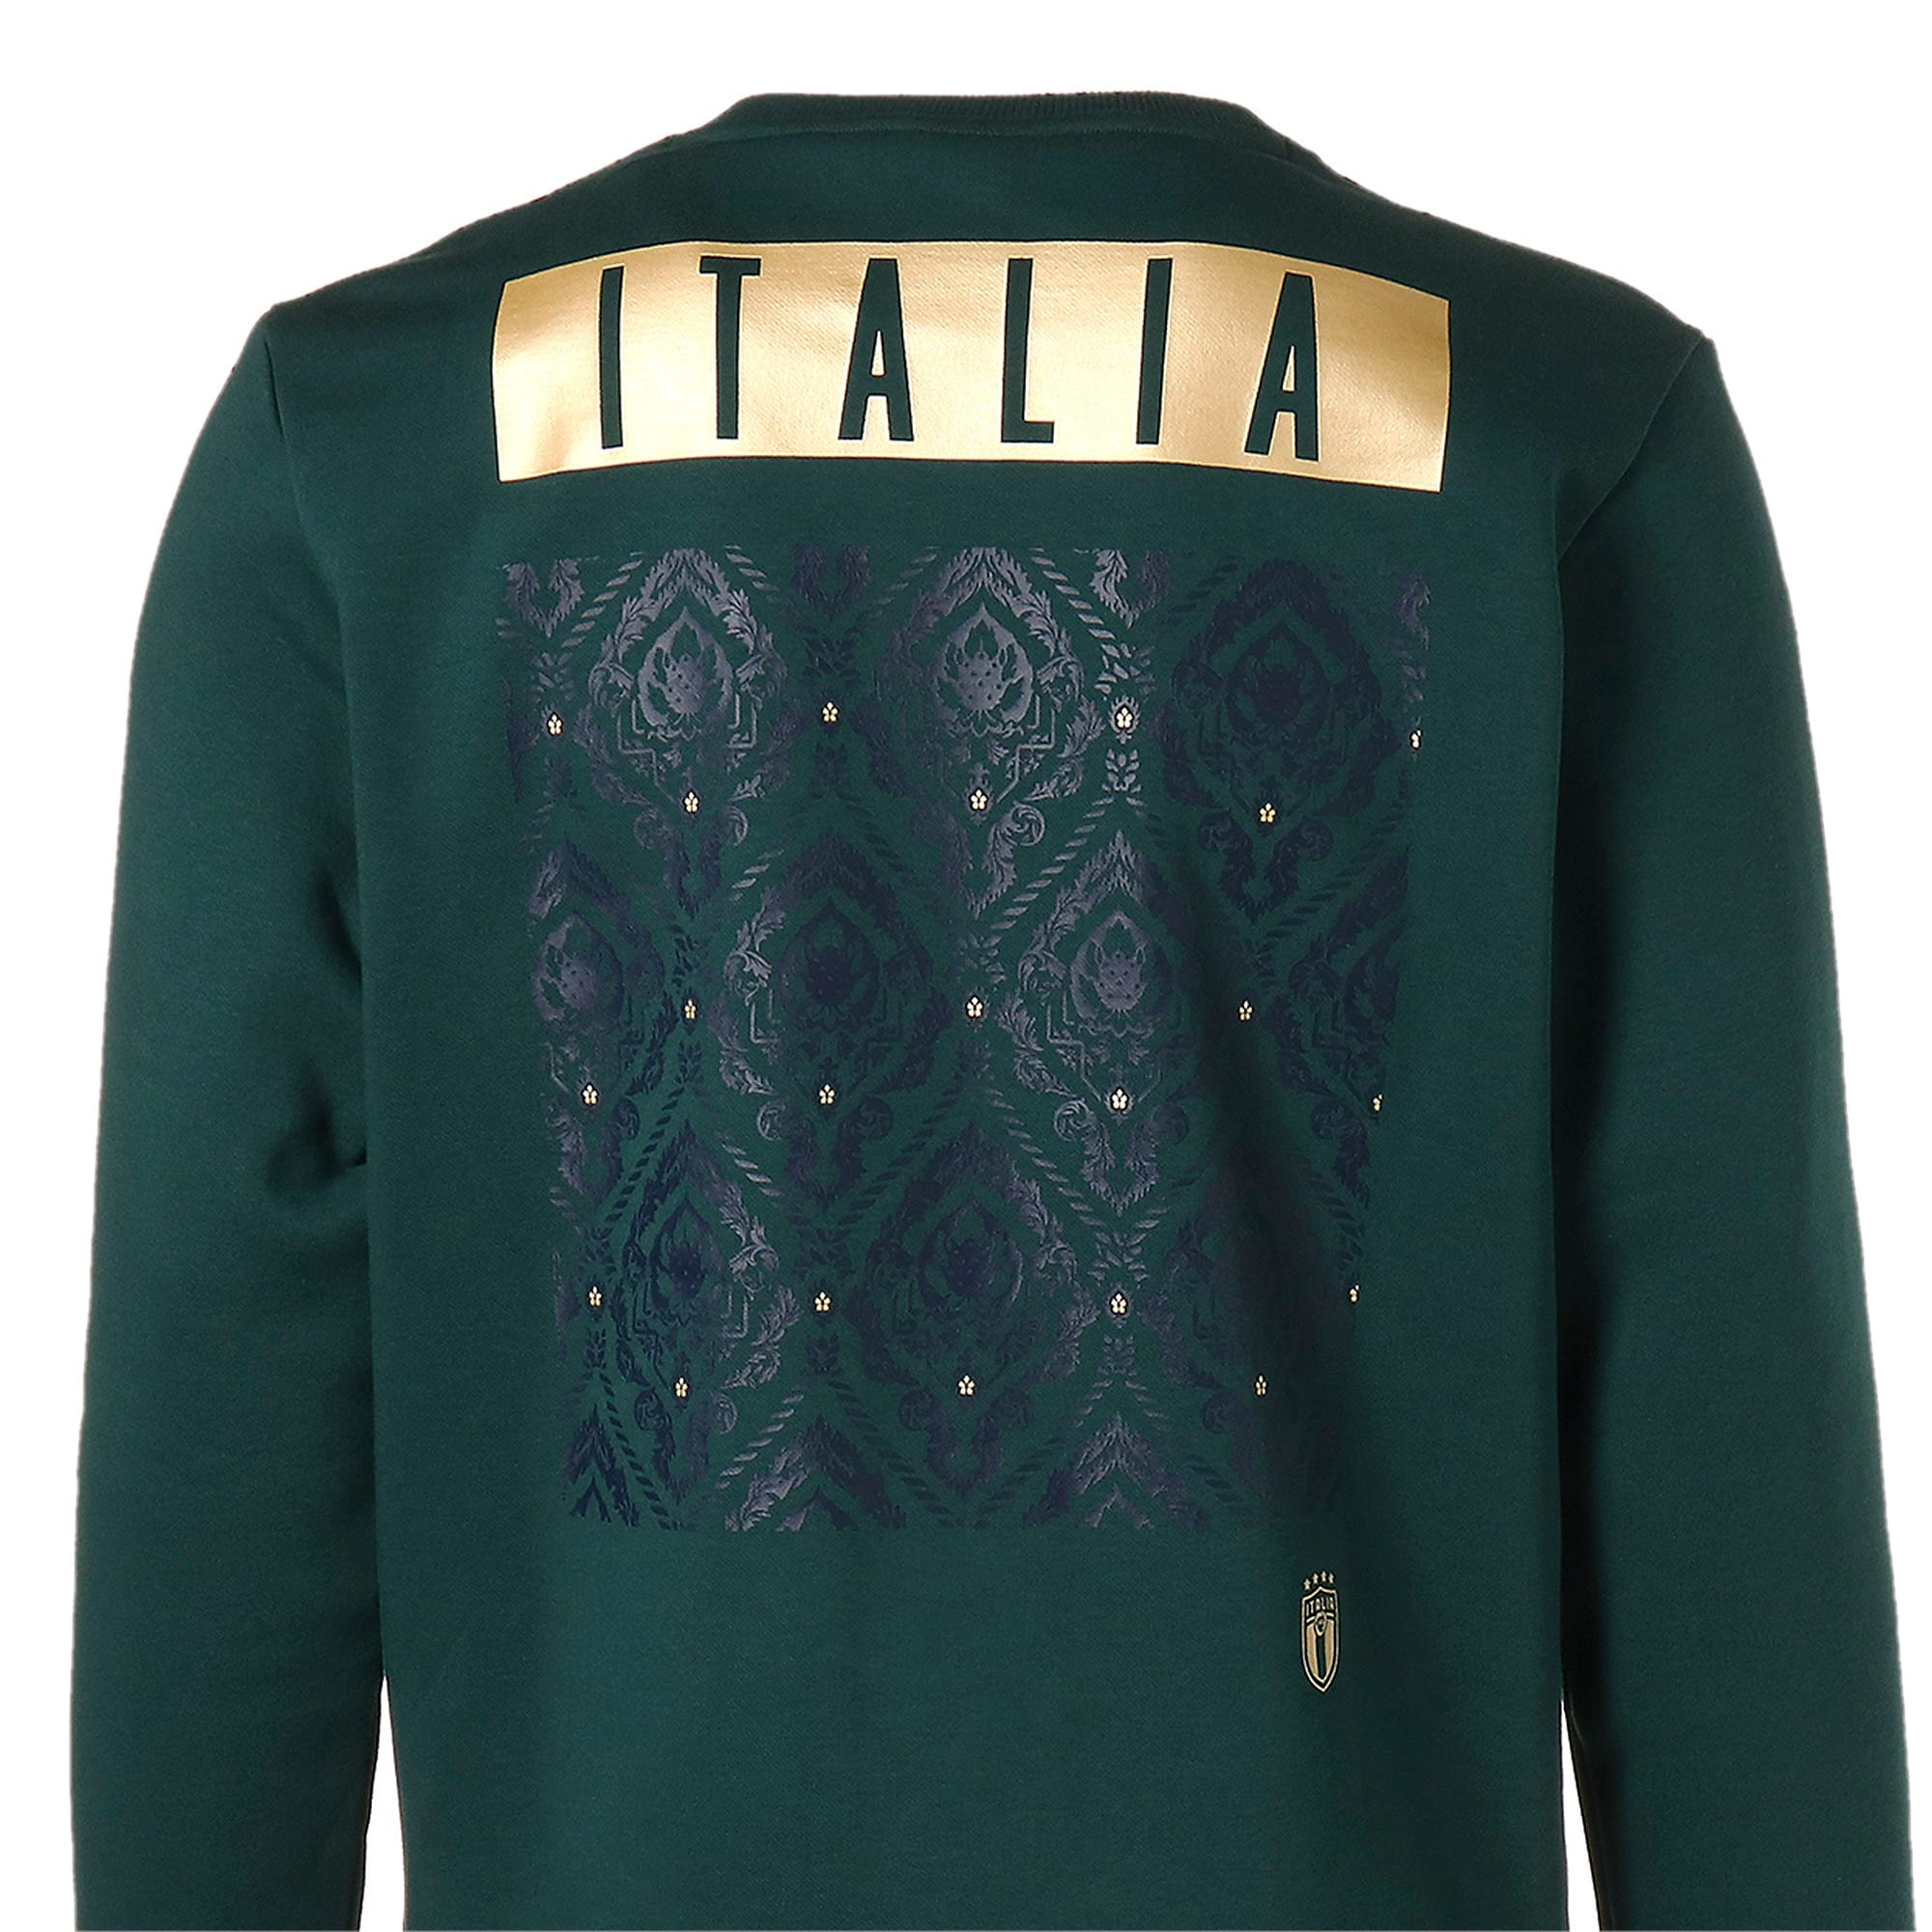 Thumbnail 8 of FIGC イタリア FTBL CULTURE クルースウェット, Ponderosa Pine-Team Gold, medium-JPN